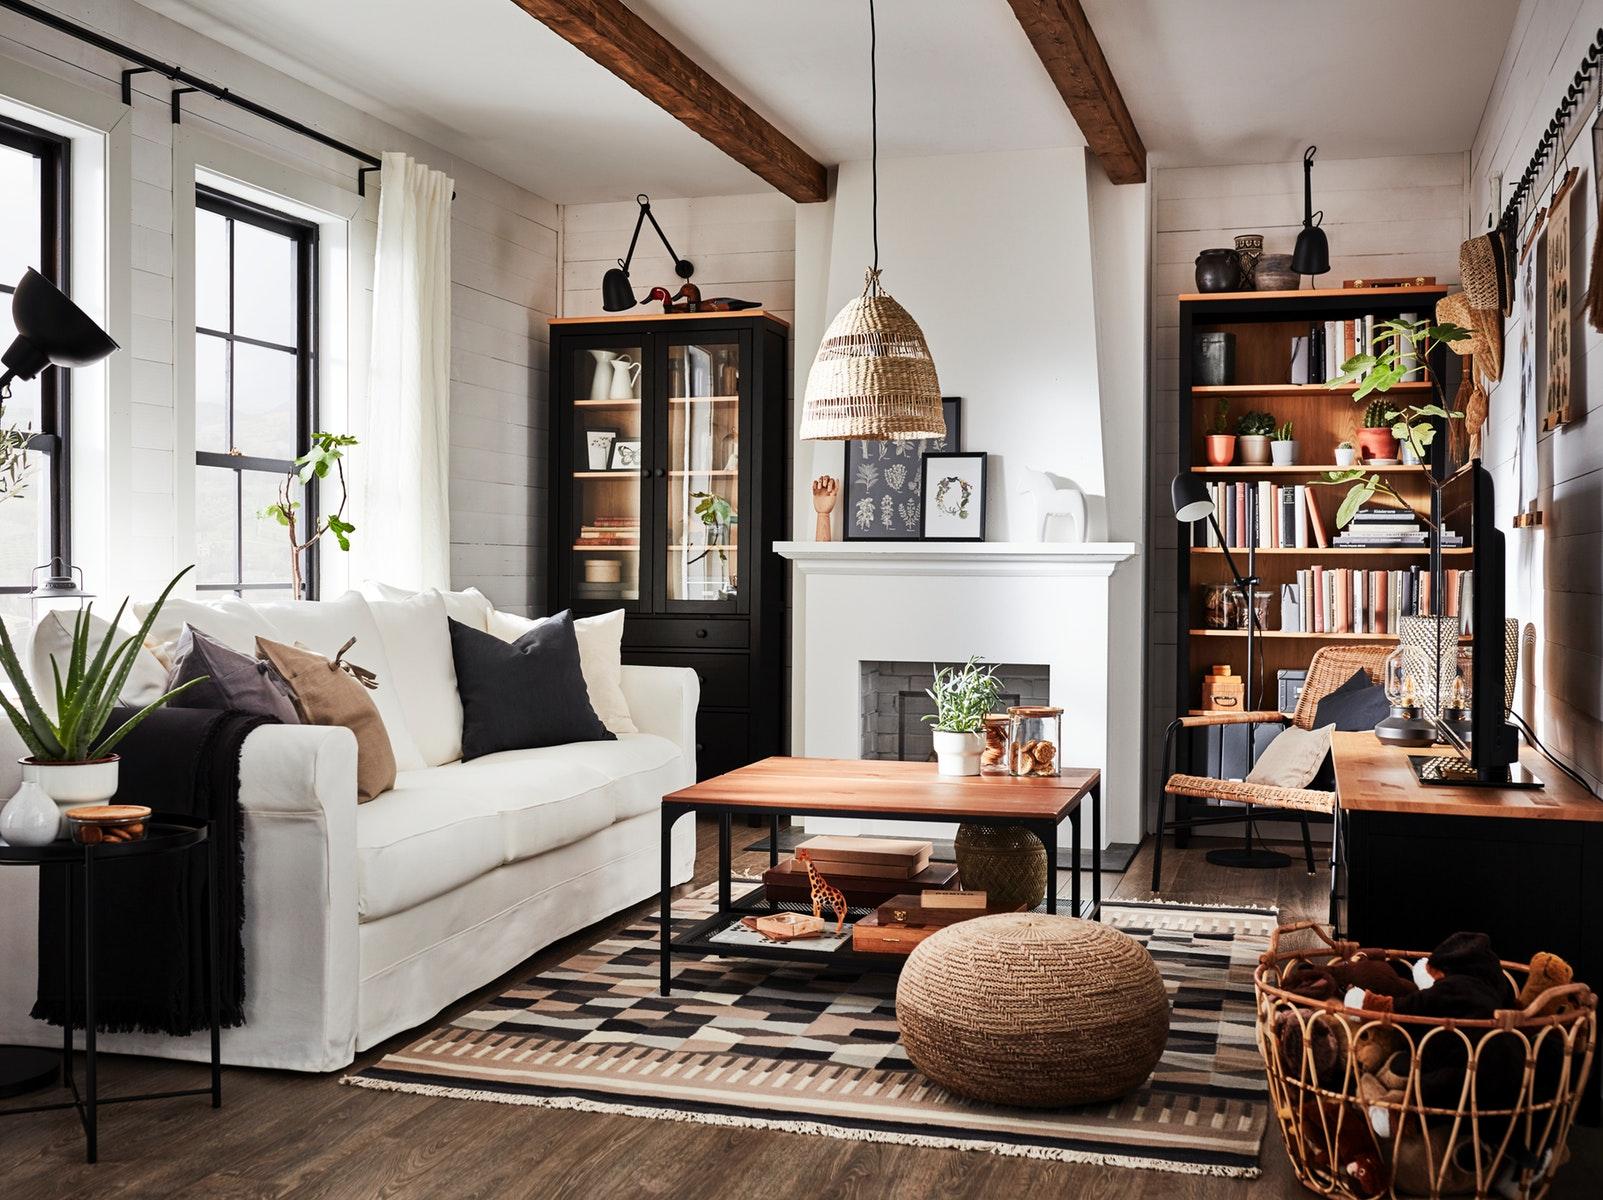 Un salón tradicional para coleccionar momentos con los tuyos